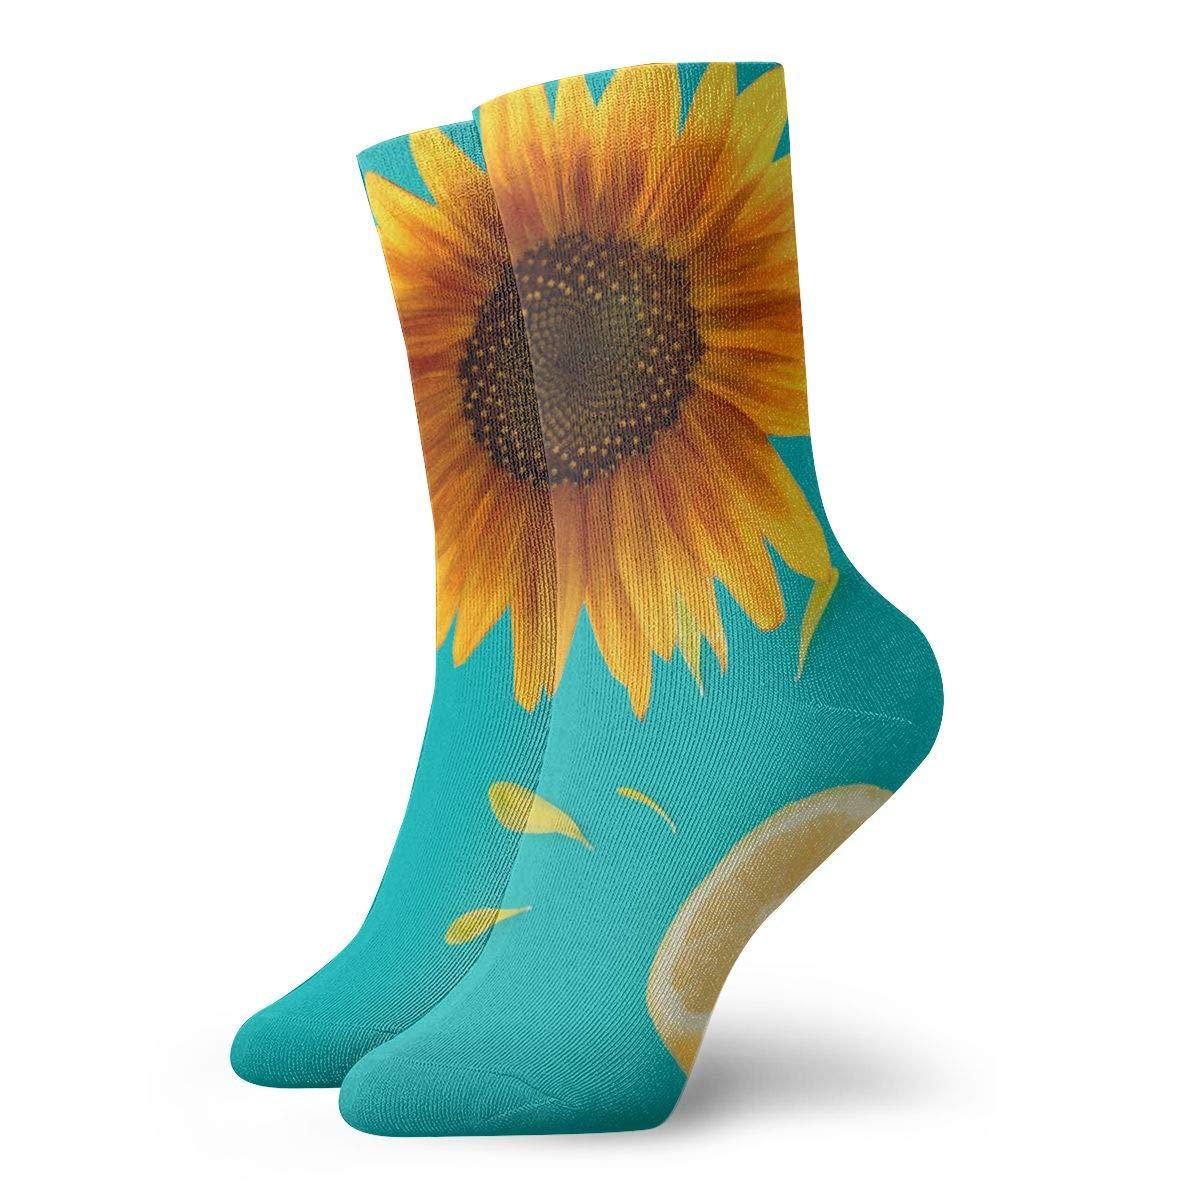 Sunflower Fashion Dress Socks Short Socks Leisure Travel 11.8 Inch